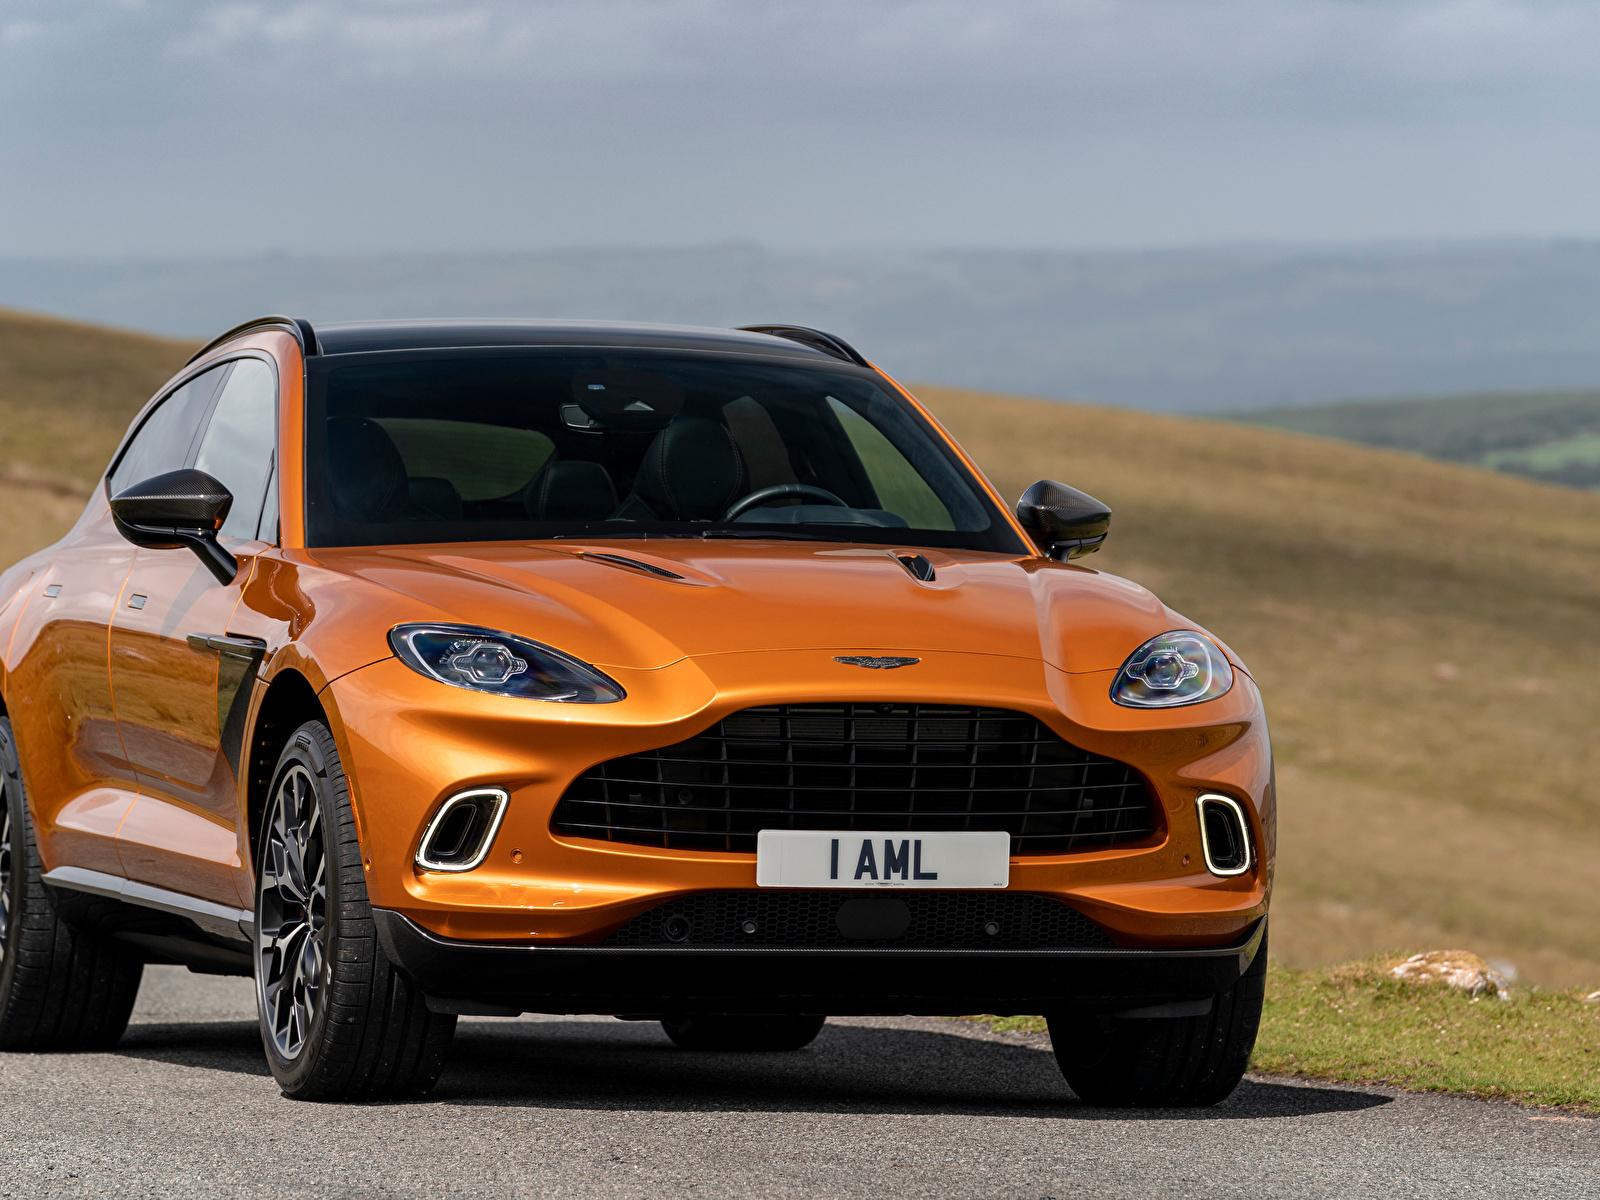 Фотографии Aston Martin Кроссовер DBX, North America, 2020 оранжевая авто Спереди Металлик 1600x1200 Астон мартин CUV Оранжевый оранжевые оранжевых машина машины Автомобили автомобиль